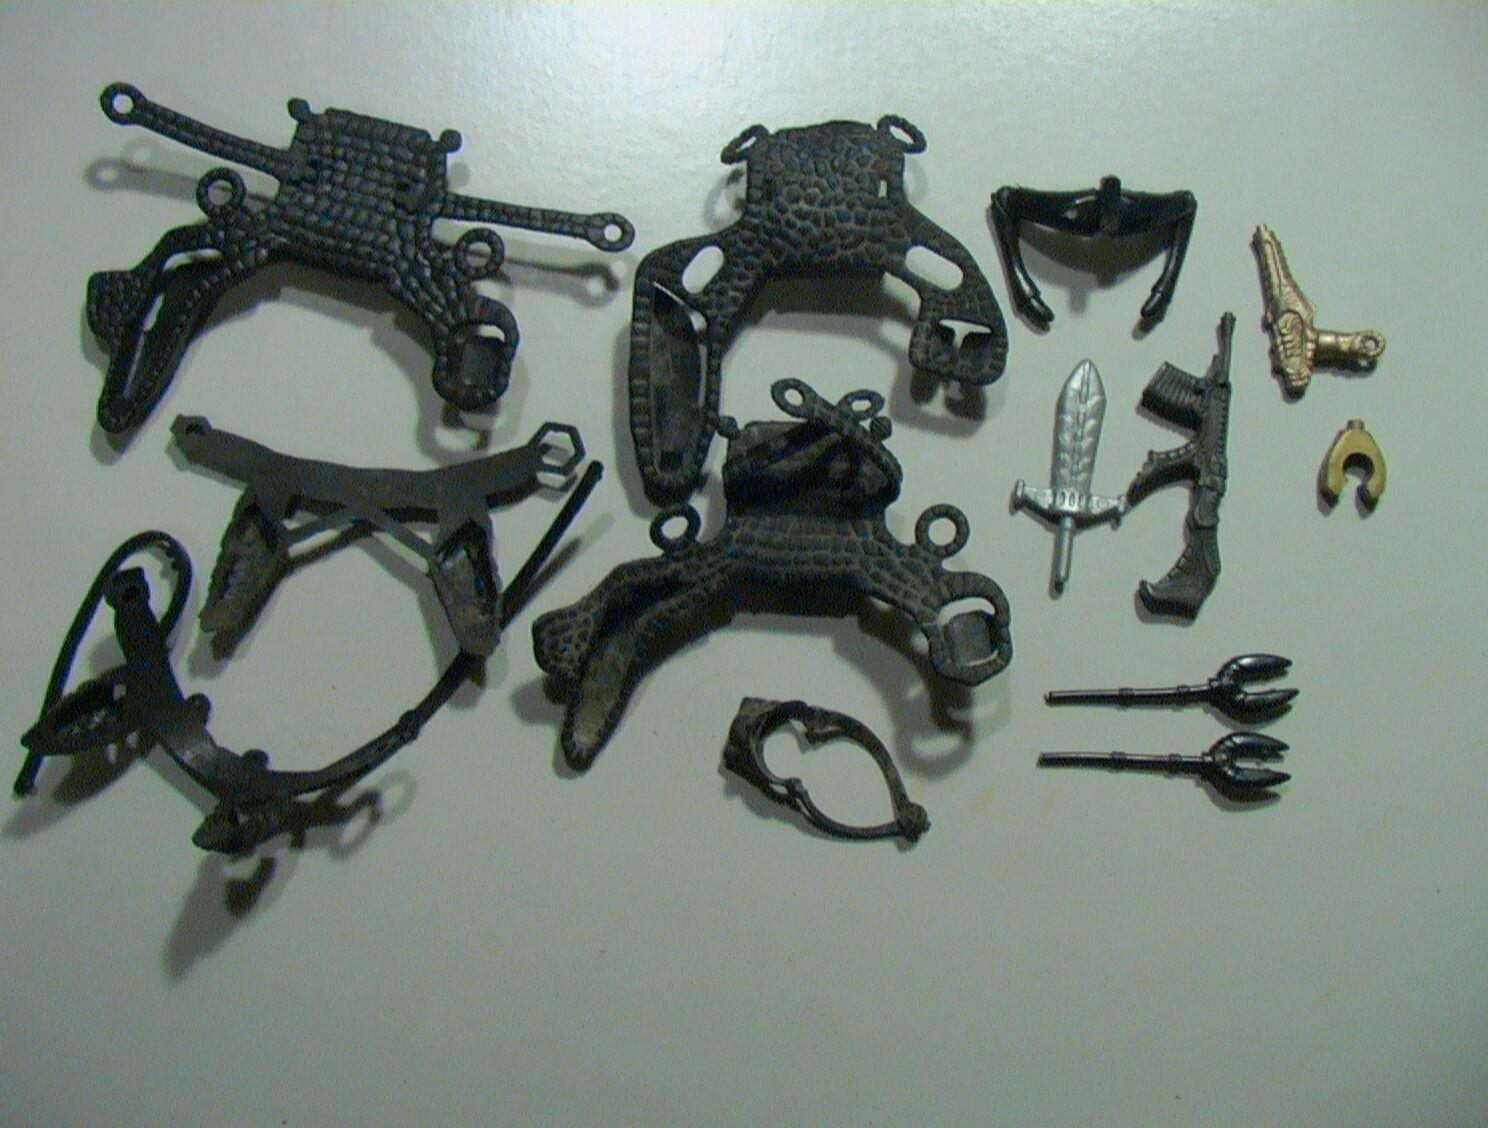 Sectaurs VINTAGE VINTAGE VINTAGE 1984  Lot of 13 Parts Belts Weapons C-6 Coleco Rubber           821cd9